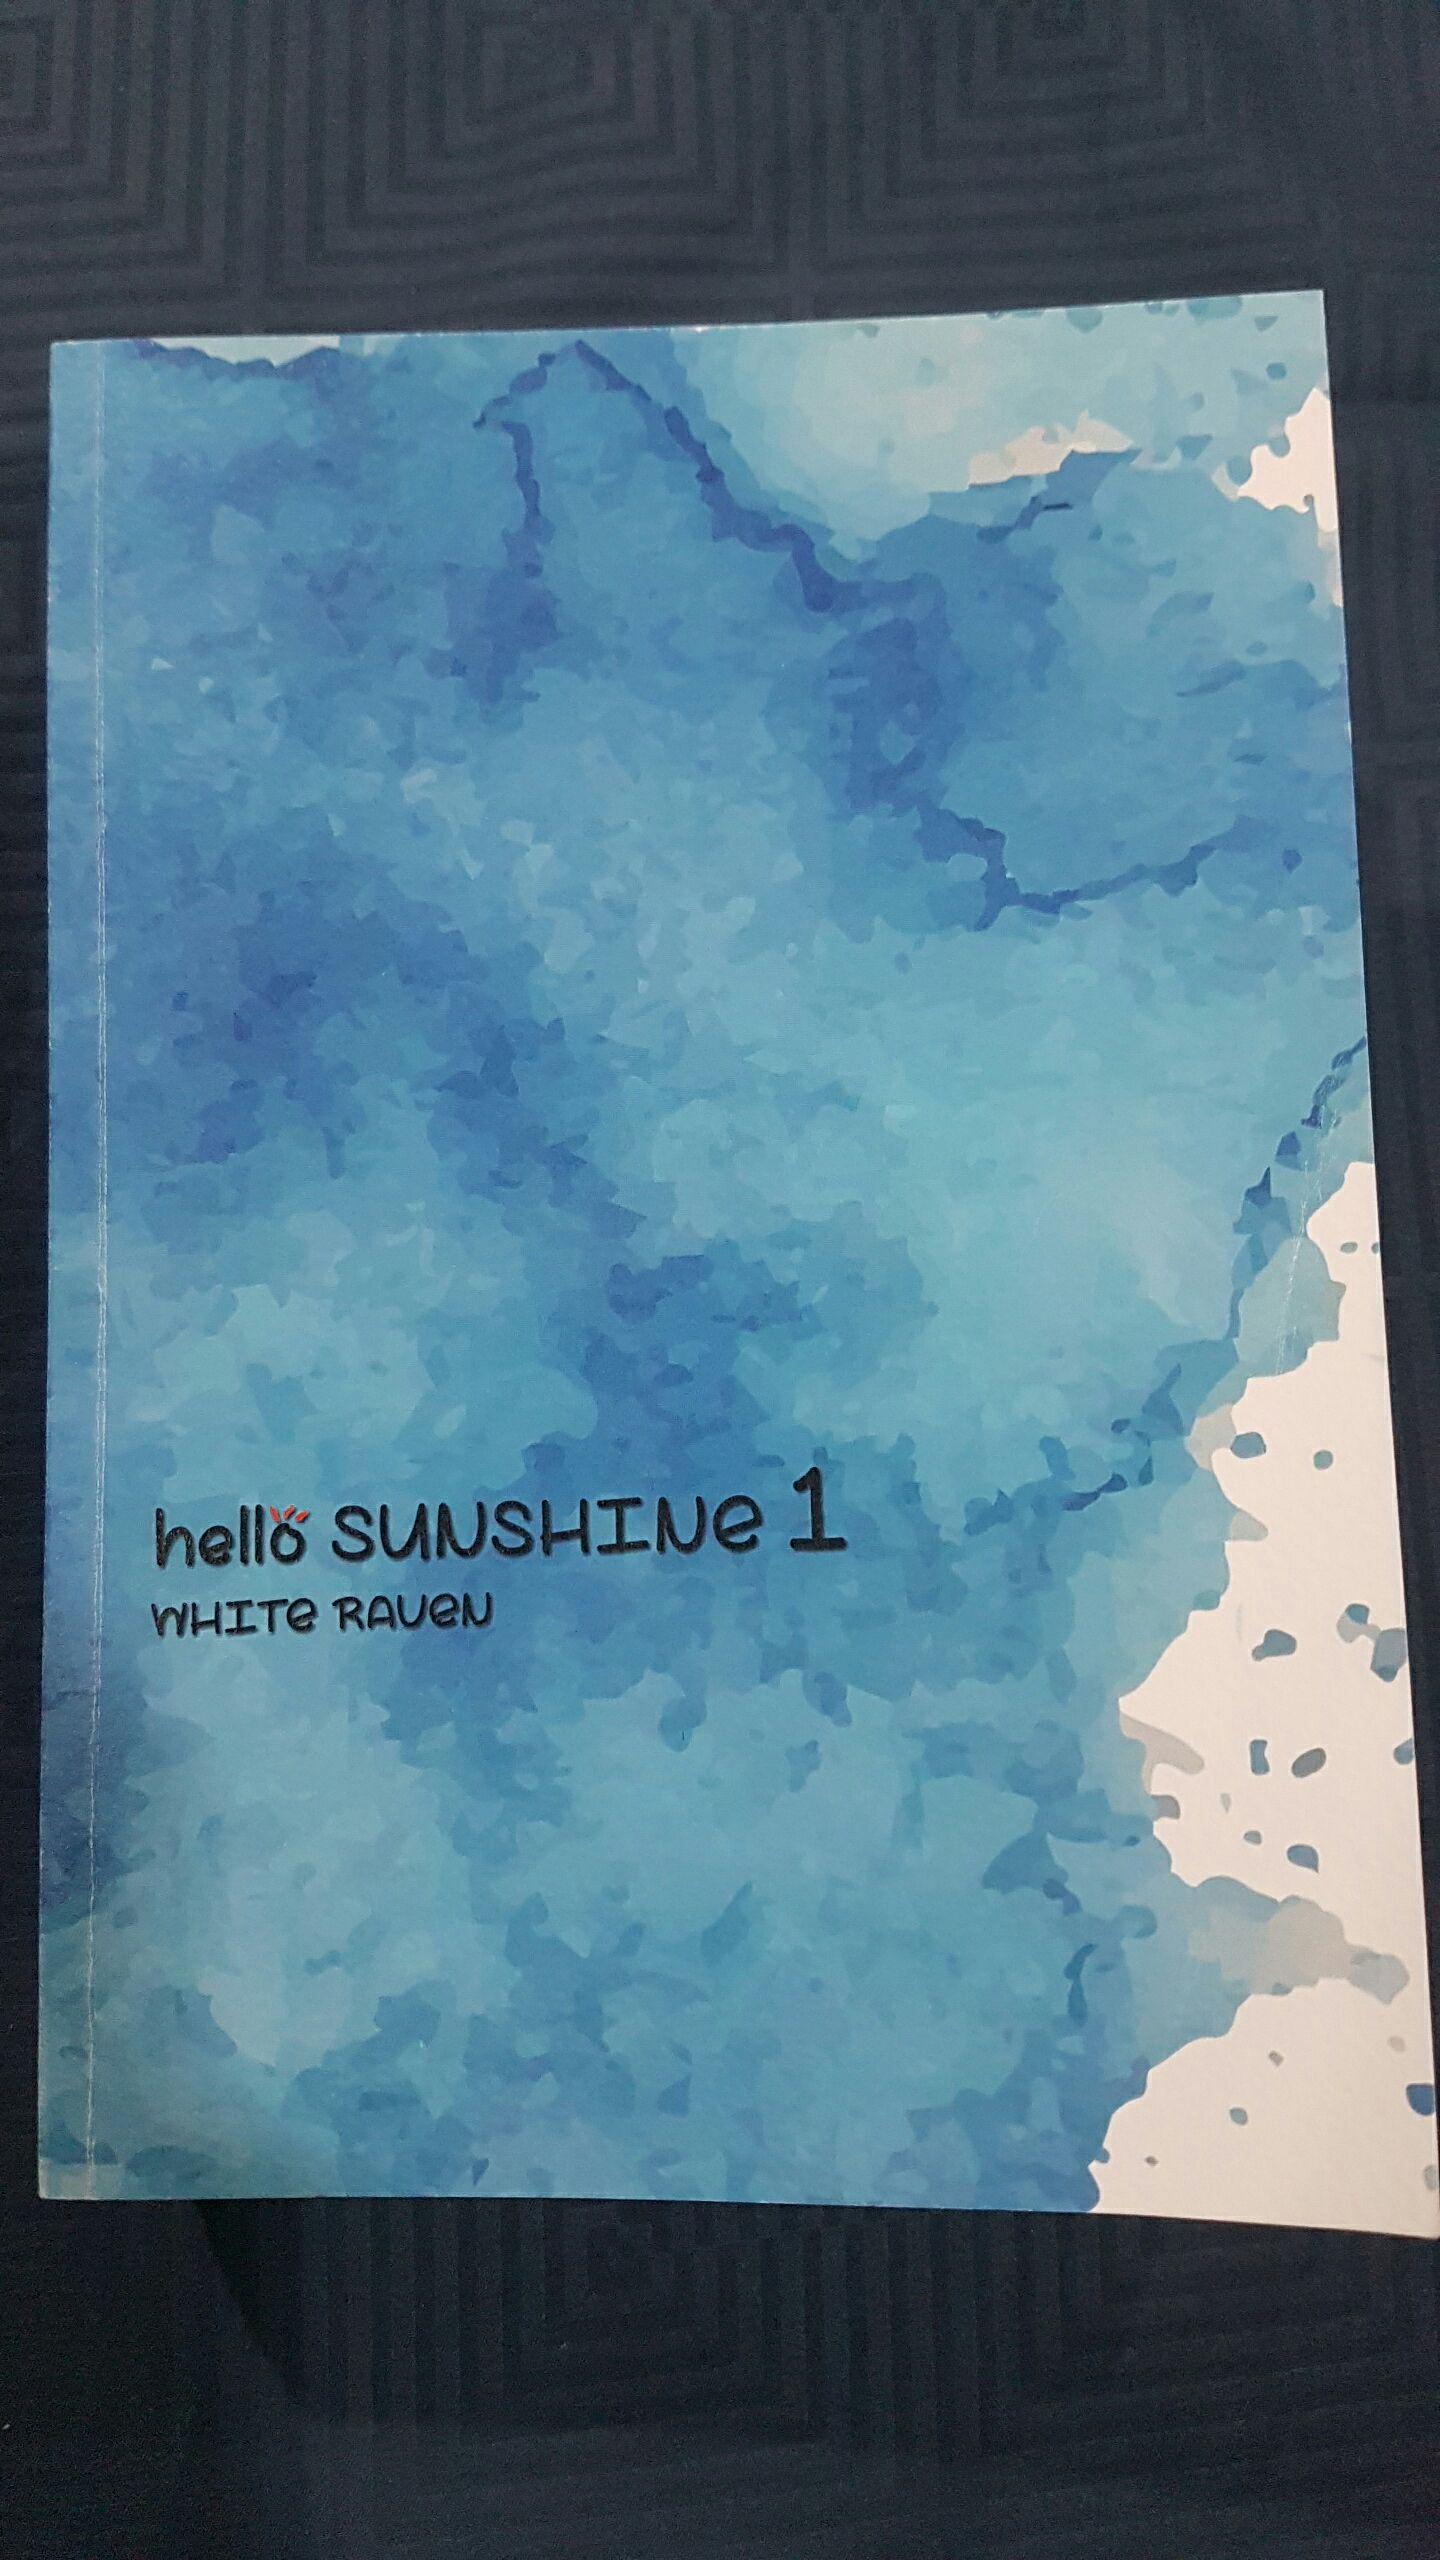 hello! SUNSHINE [ตะวันร้าย..ที่รัก] ฺBy White Raven เล่ม 1 มัดจำ 400 ค่าเช่า 80b.